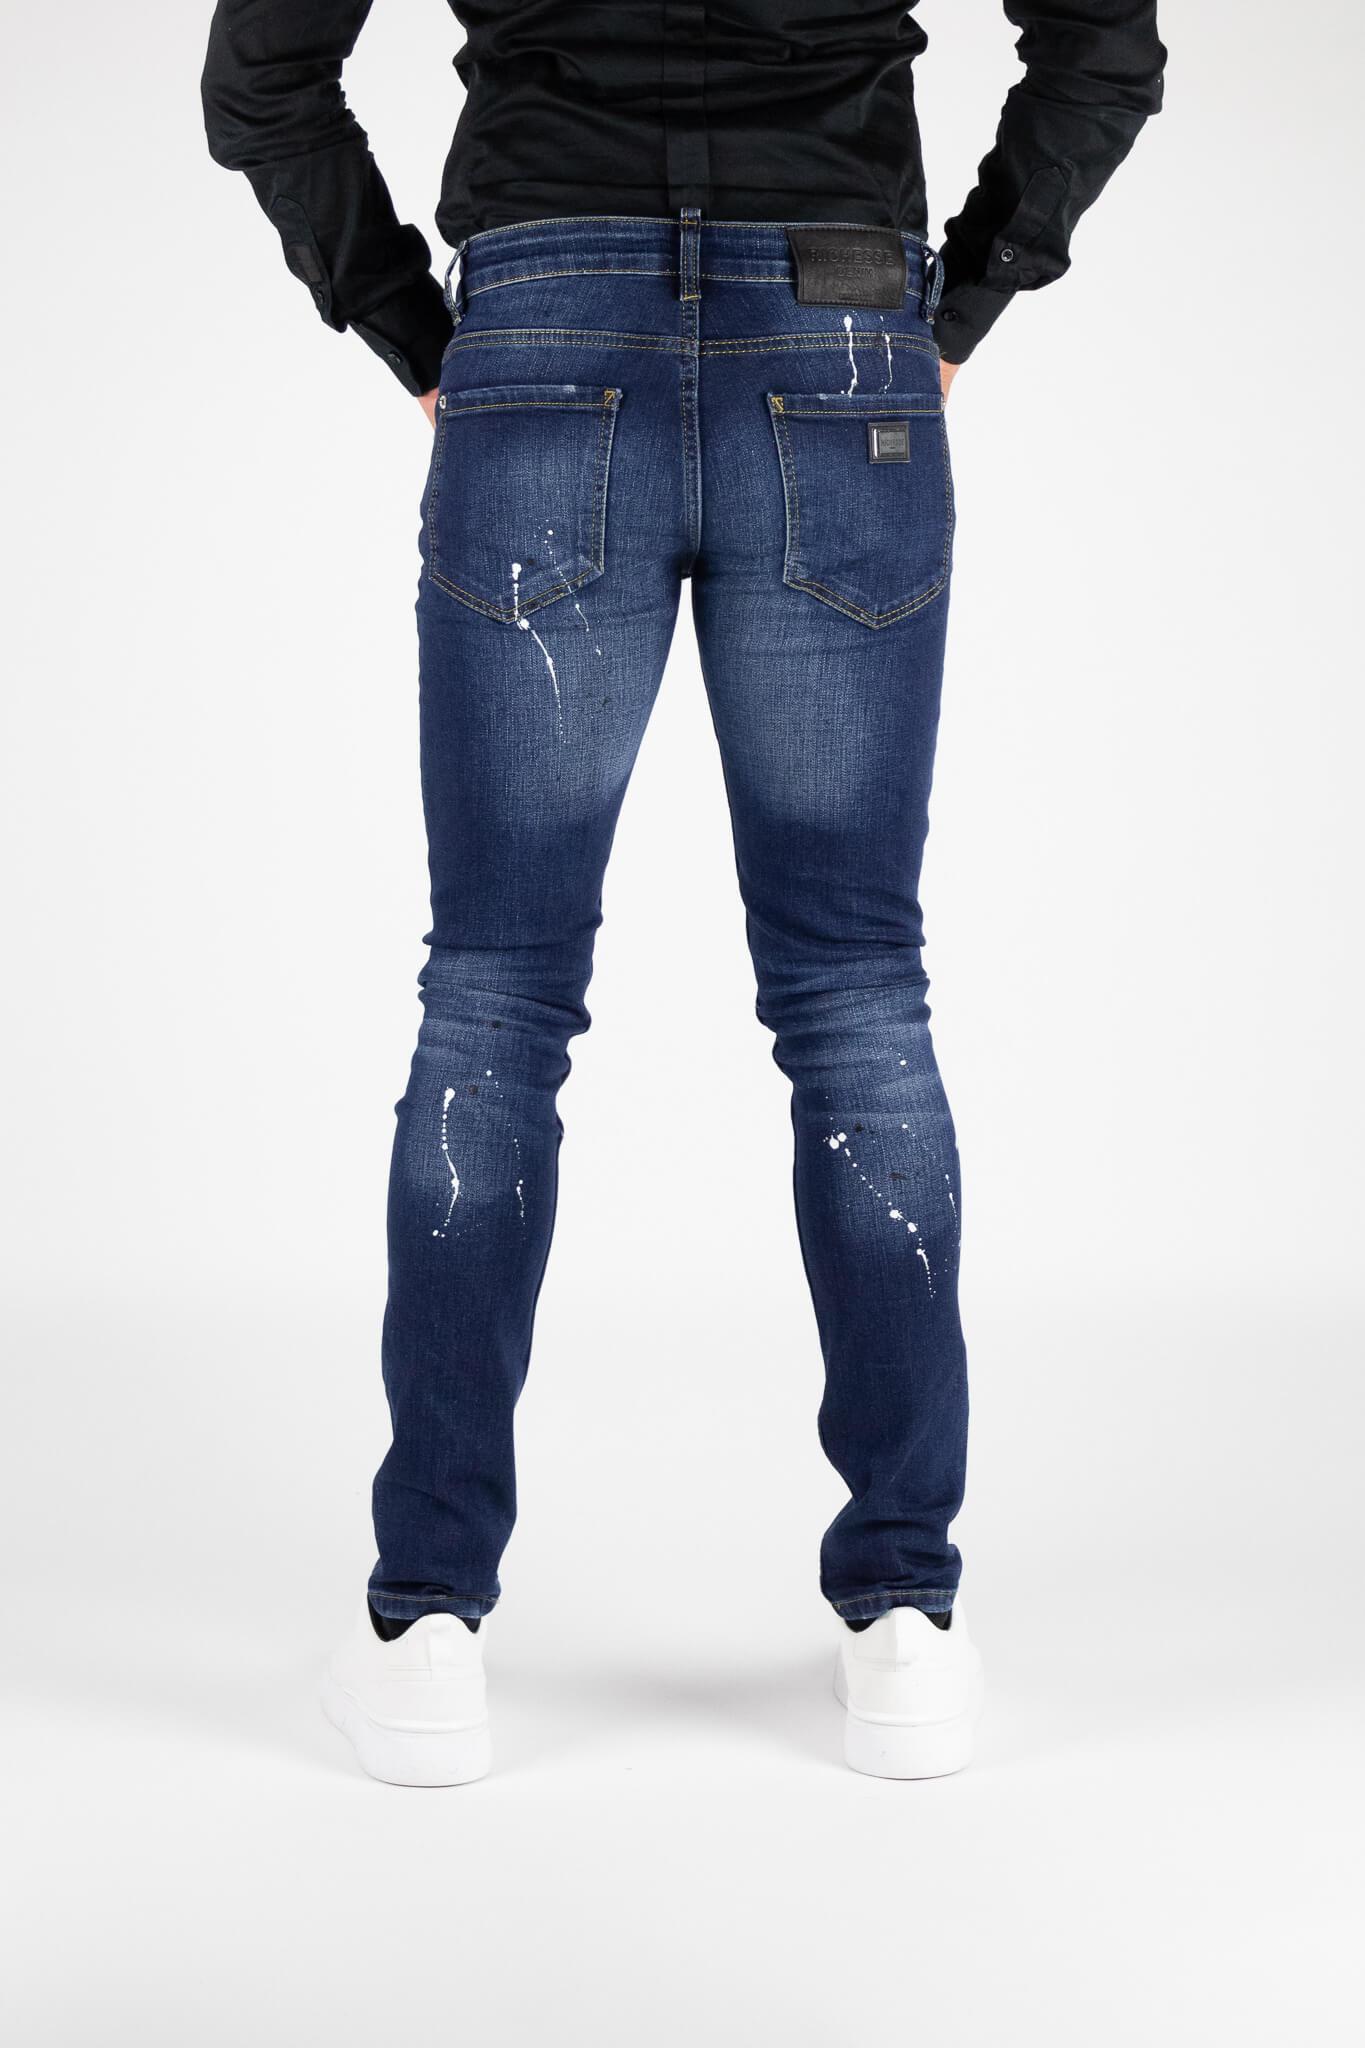 Toulon-Blue-Jeans-6.jpg